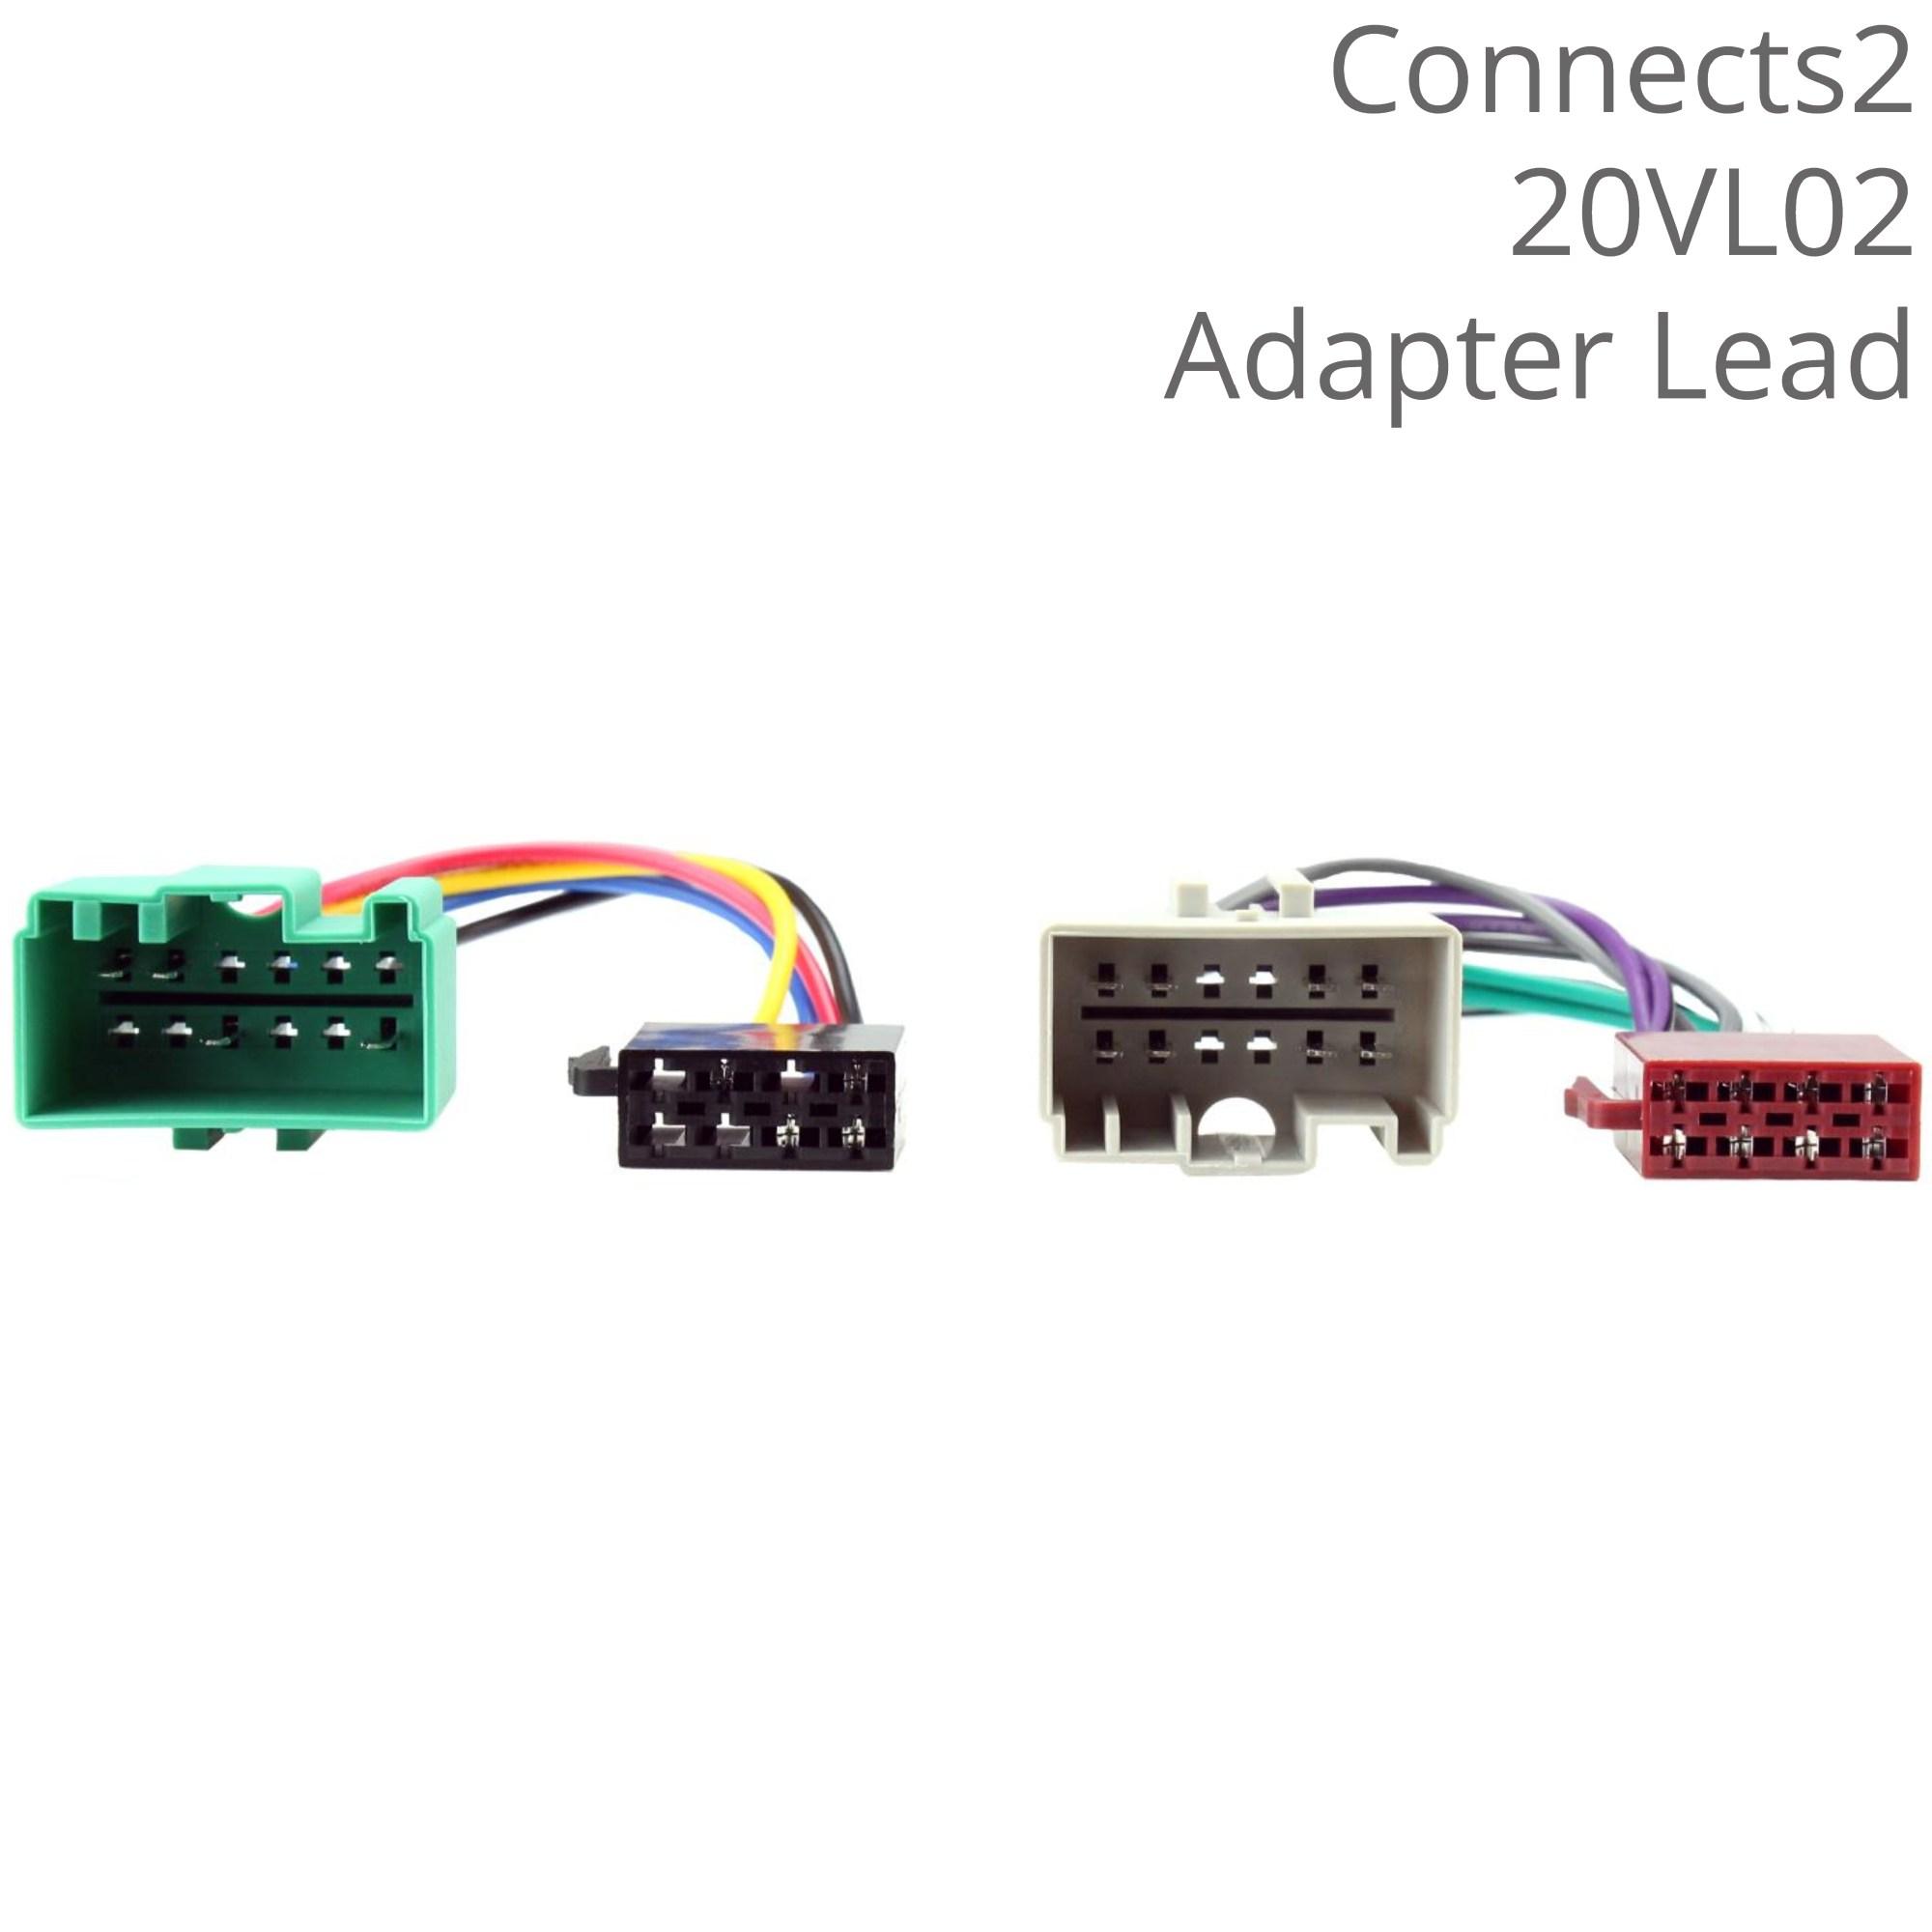 hight resolution of s80 v70 v40 v80 xc70 c2 car iso wiring harness adaptor lead for volvo s40 s60 s80 v70 v40 v80 xc70 sustuu